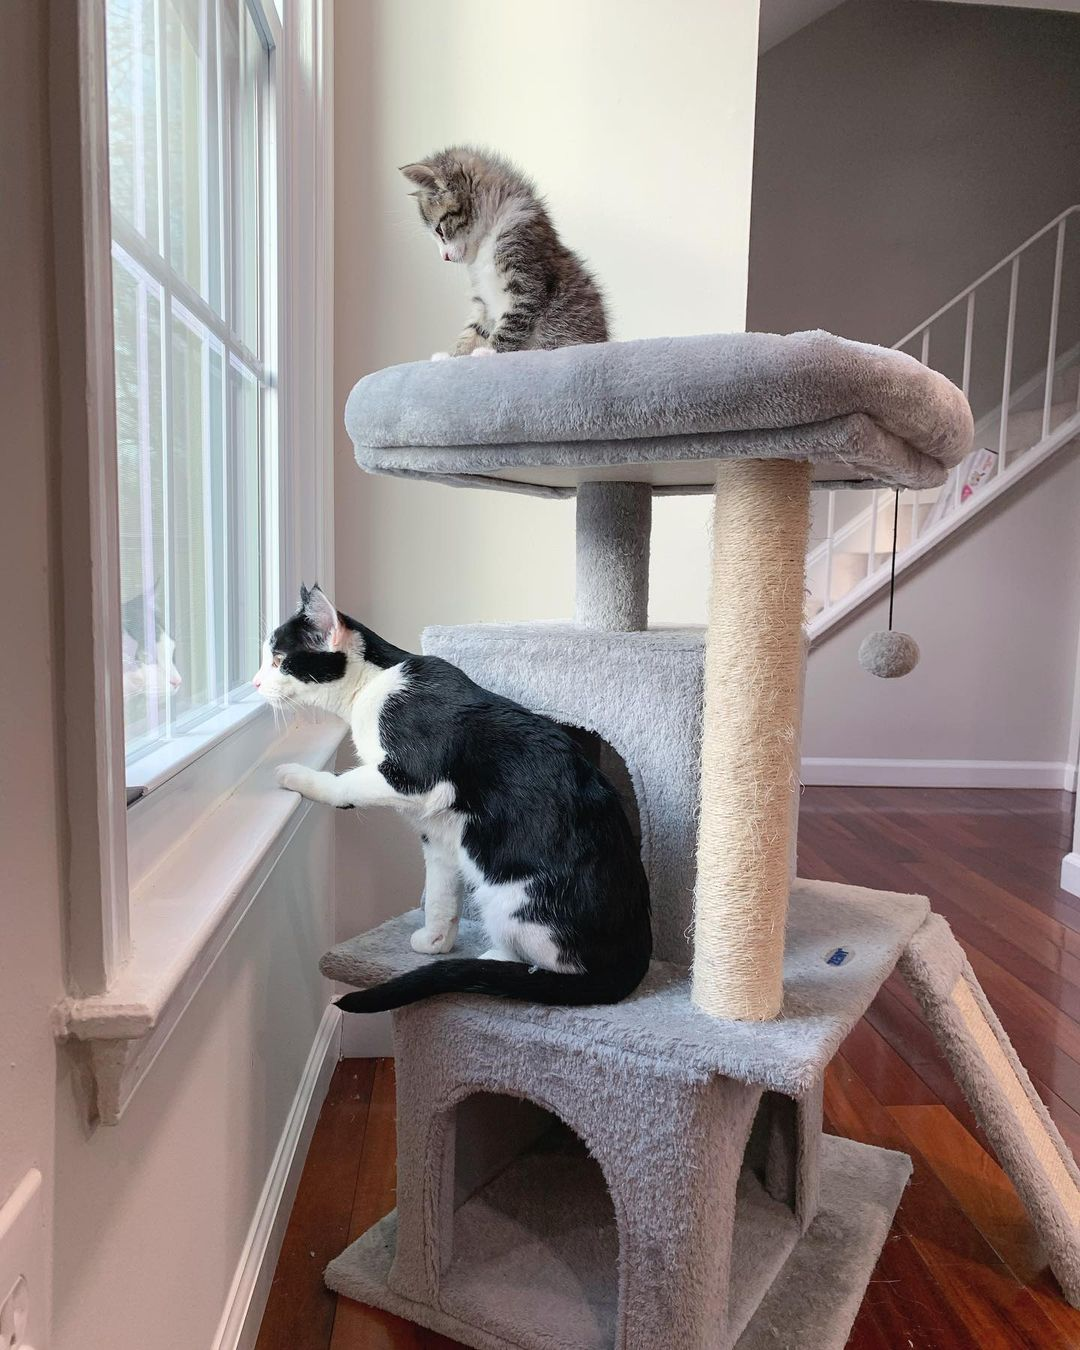 Gatitos ven por la ventana